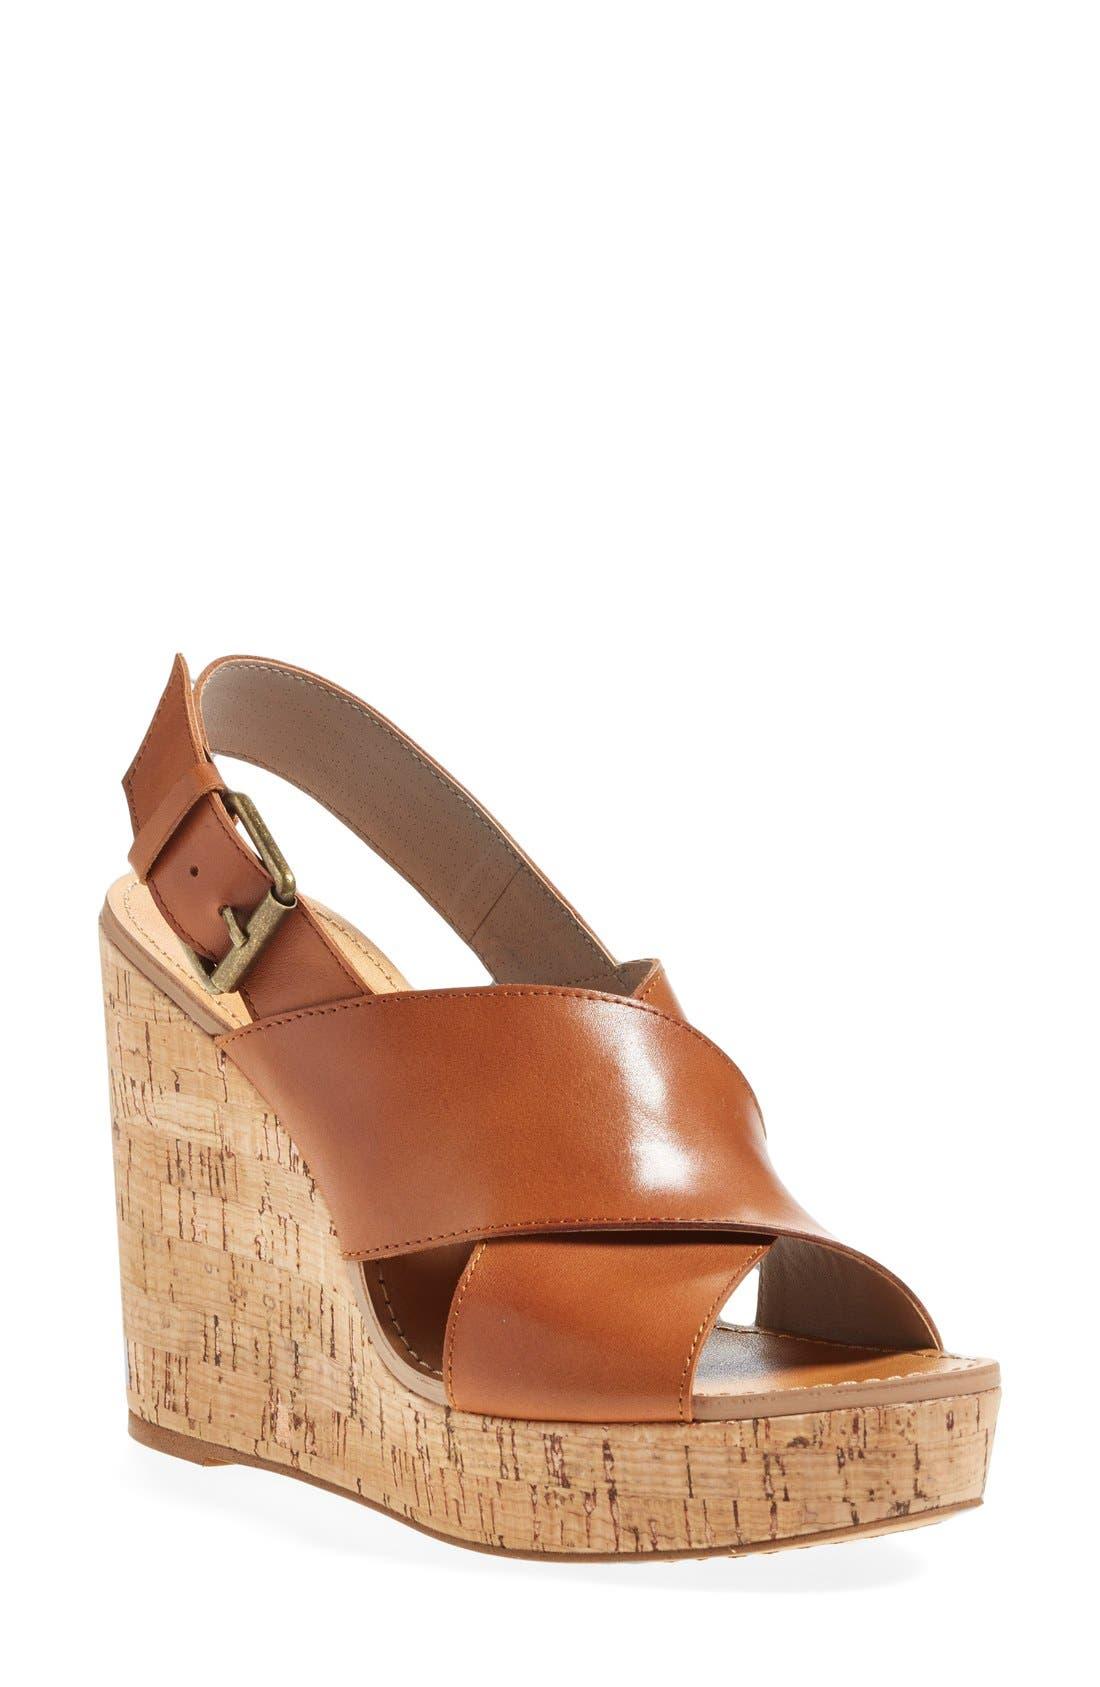 Alternate Image 1 Selected - Hinge 'Hannah' Wedge Sandal (Women)